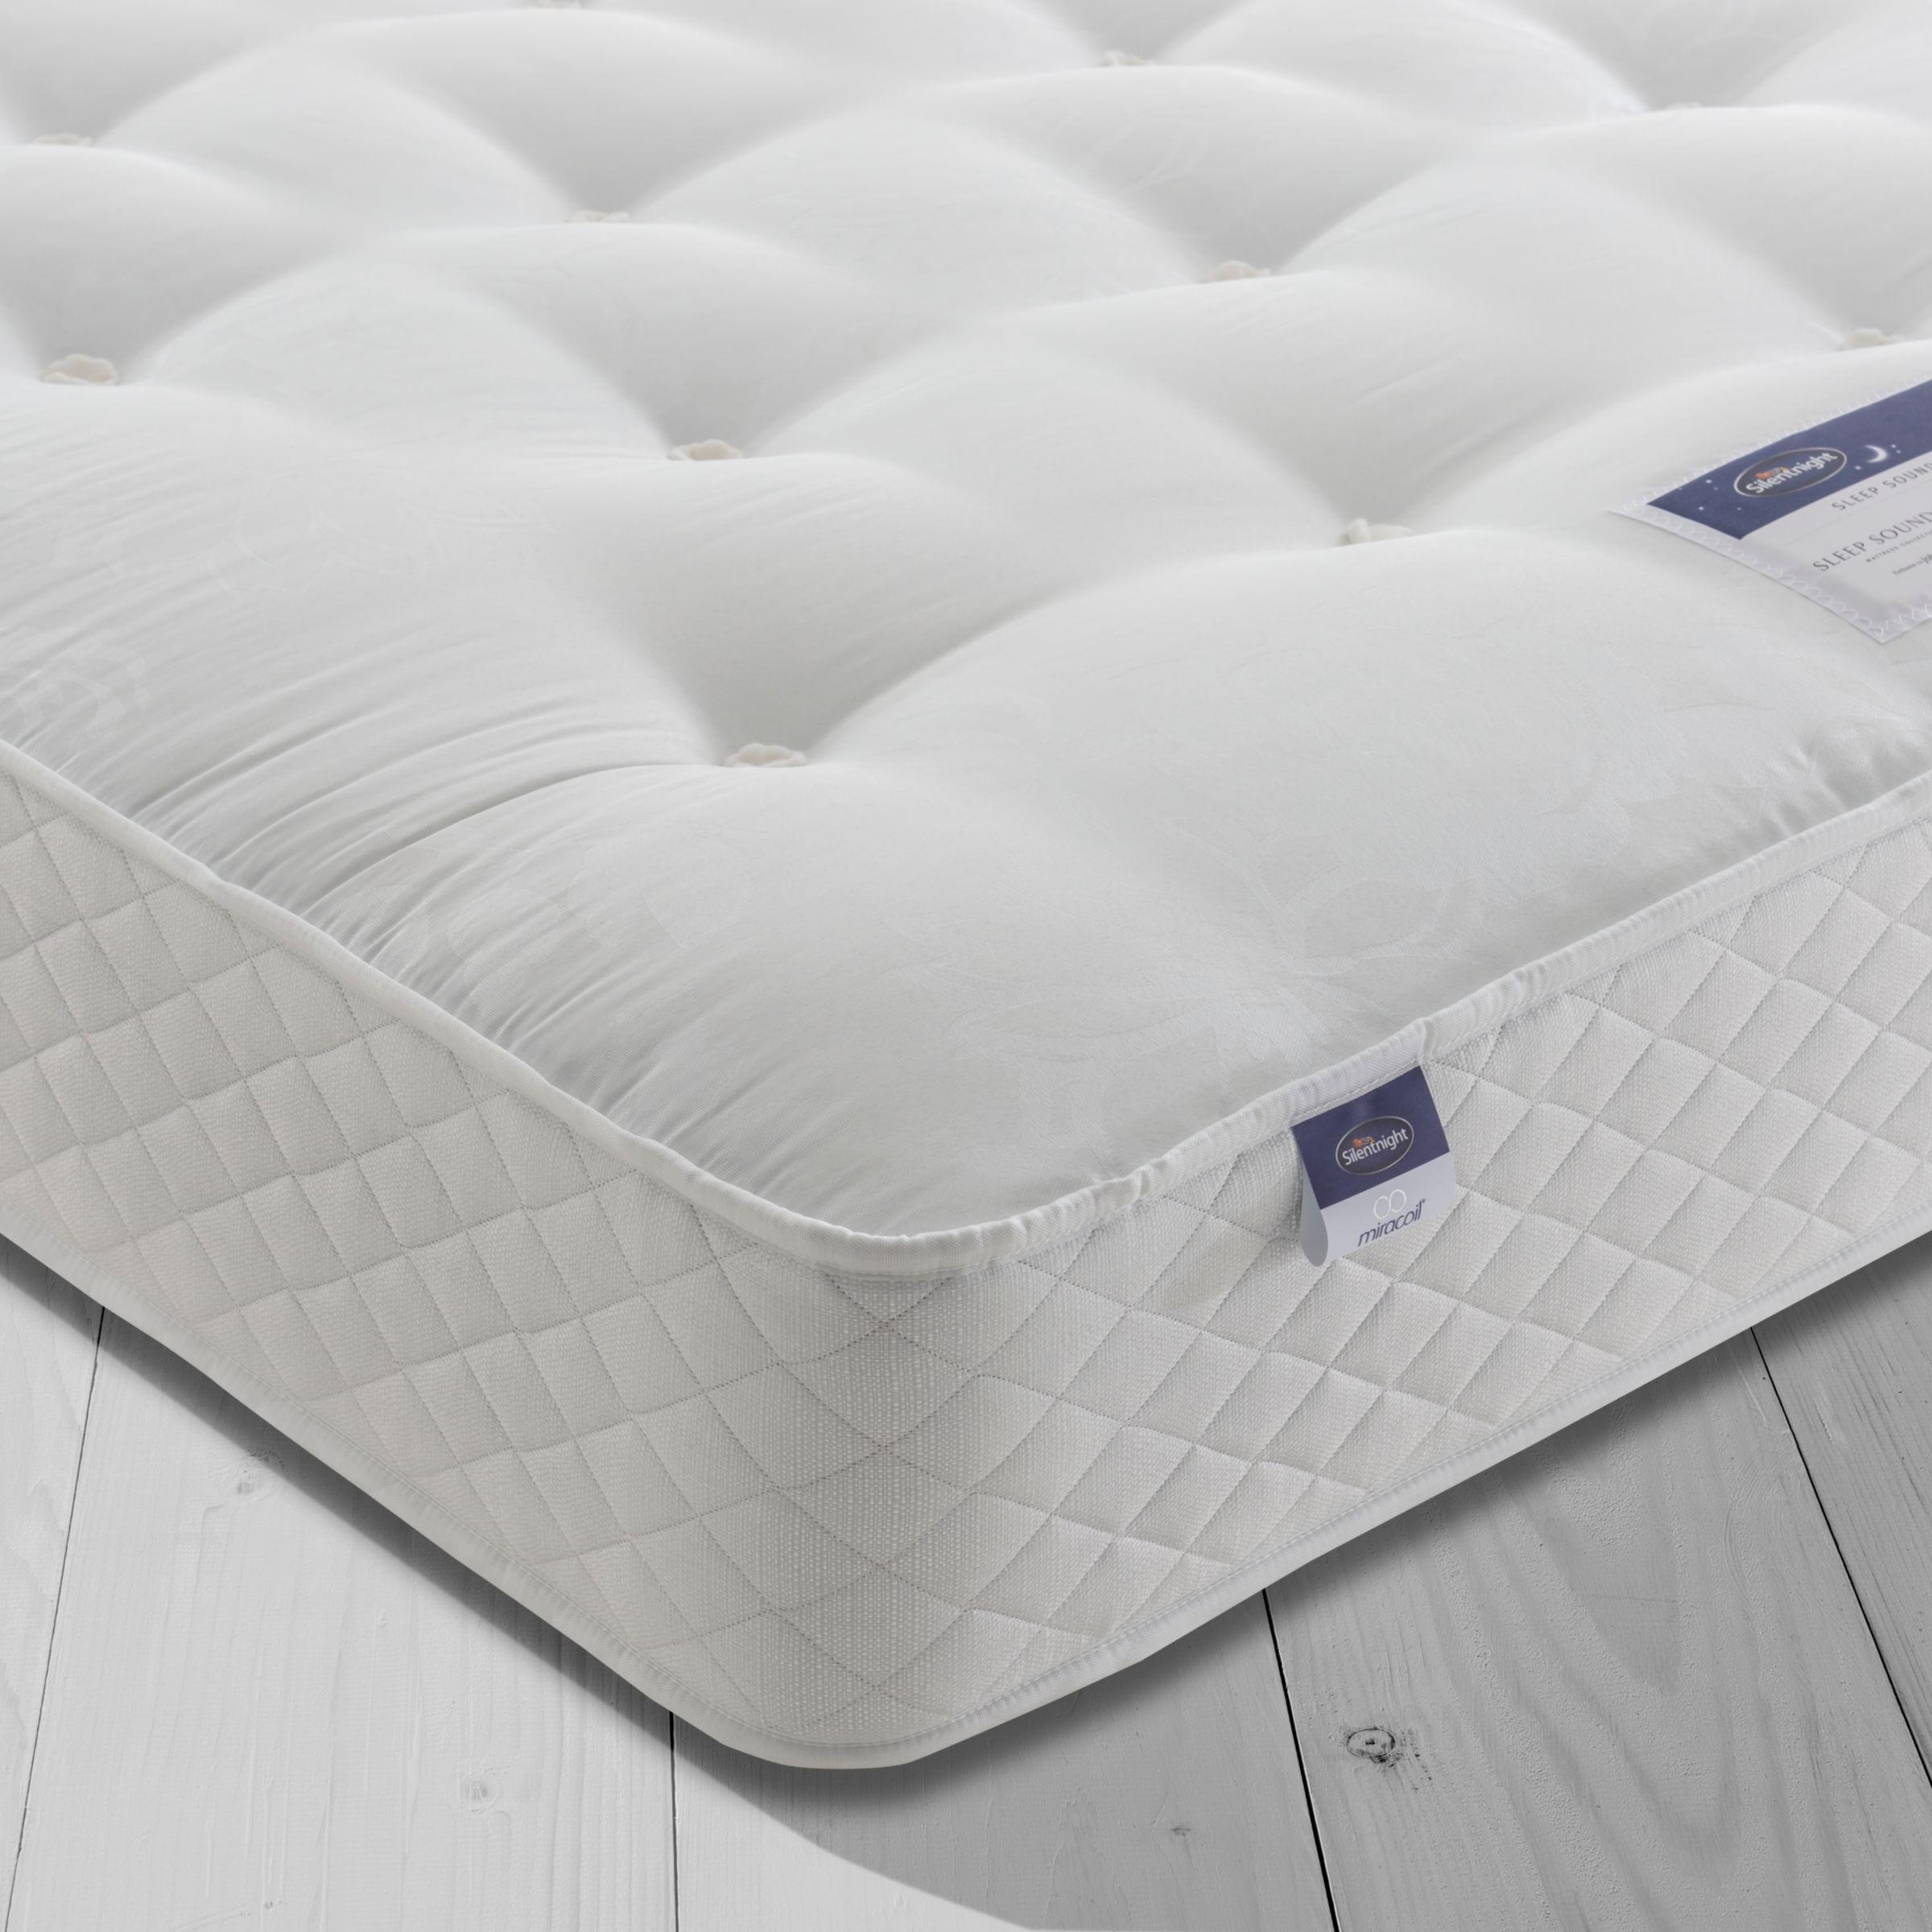 Silentnight Silentnight Sleep Soundly Miracoil Ortho Mattress, Firm, Super King Size